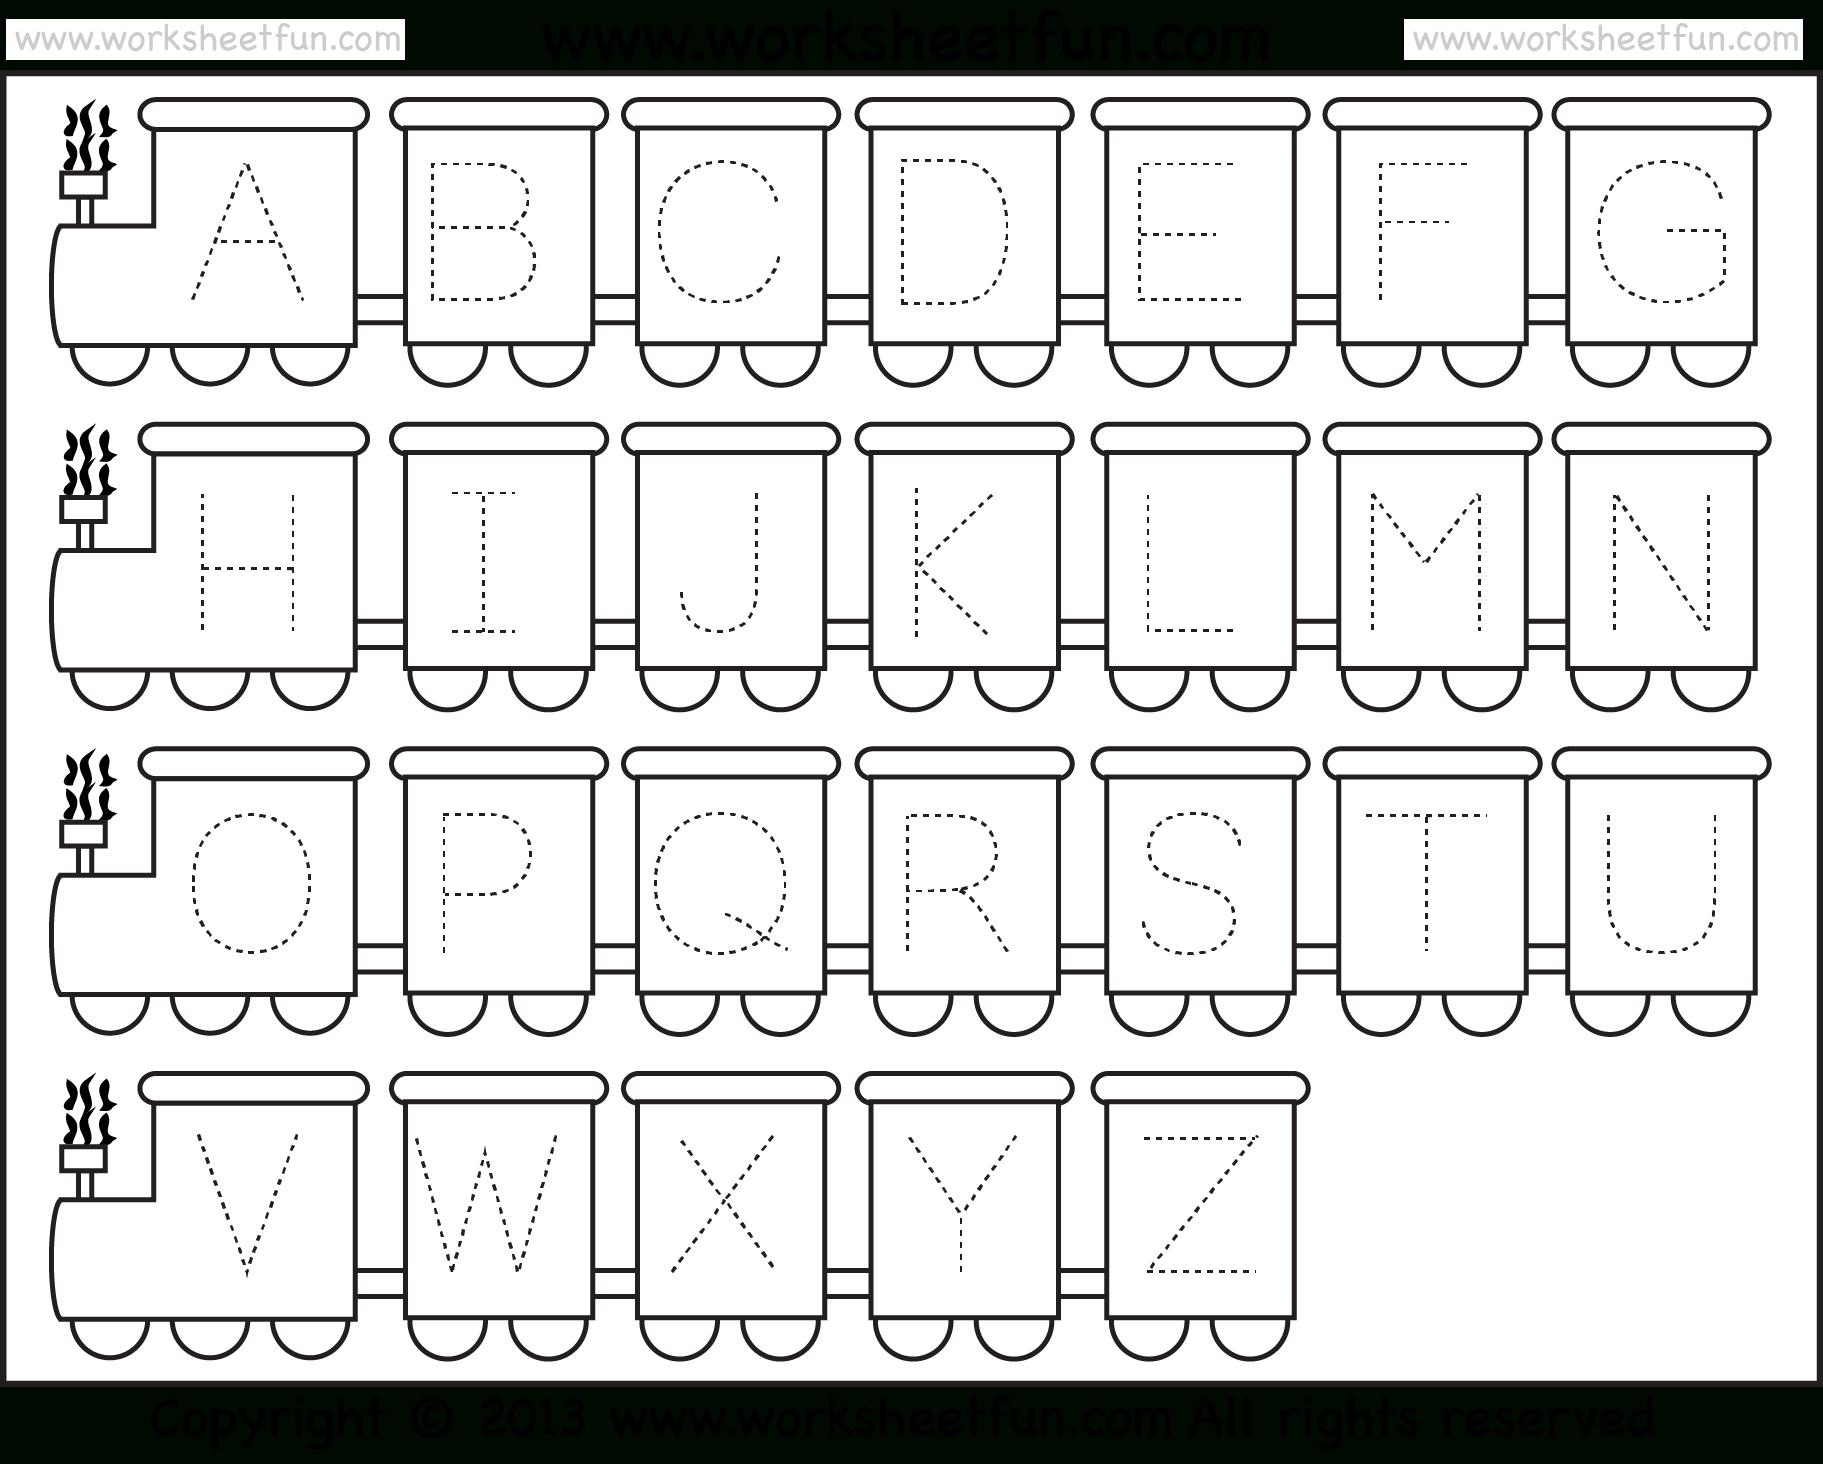 Letter Tracing Worksheet – Train Theme / Free Printable Worksheets - Free Printable Alphabet Worksheets For Kindergarten